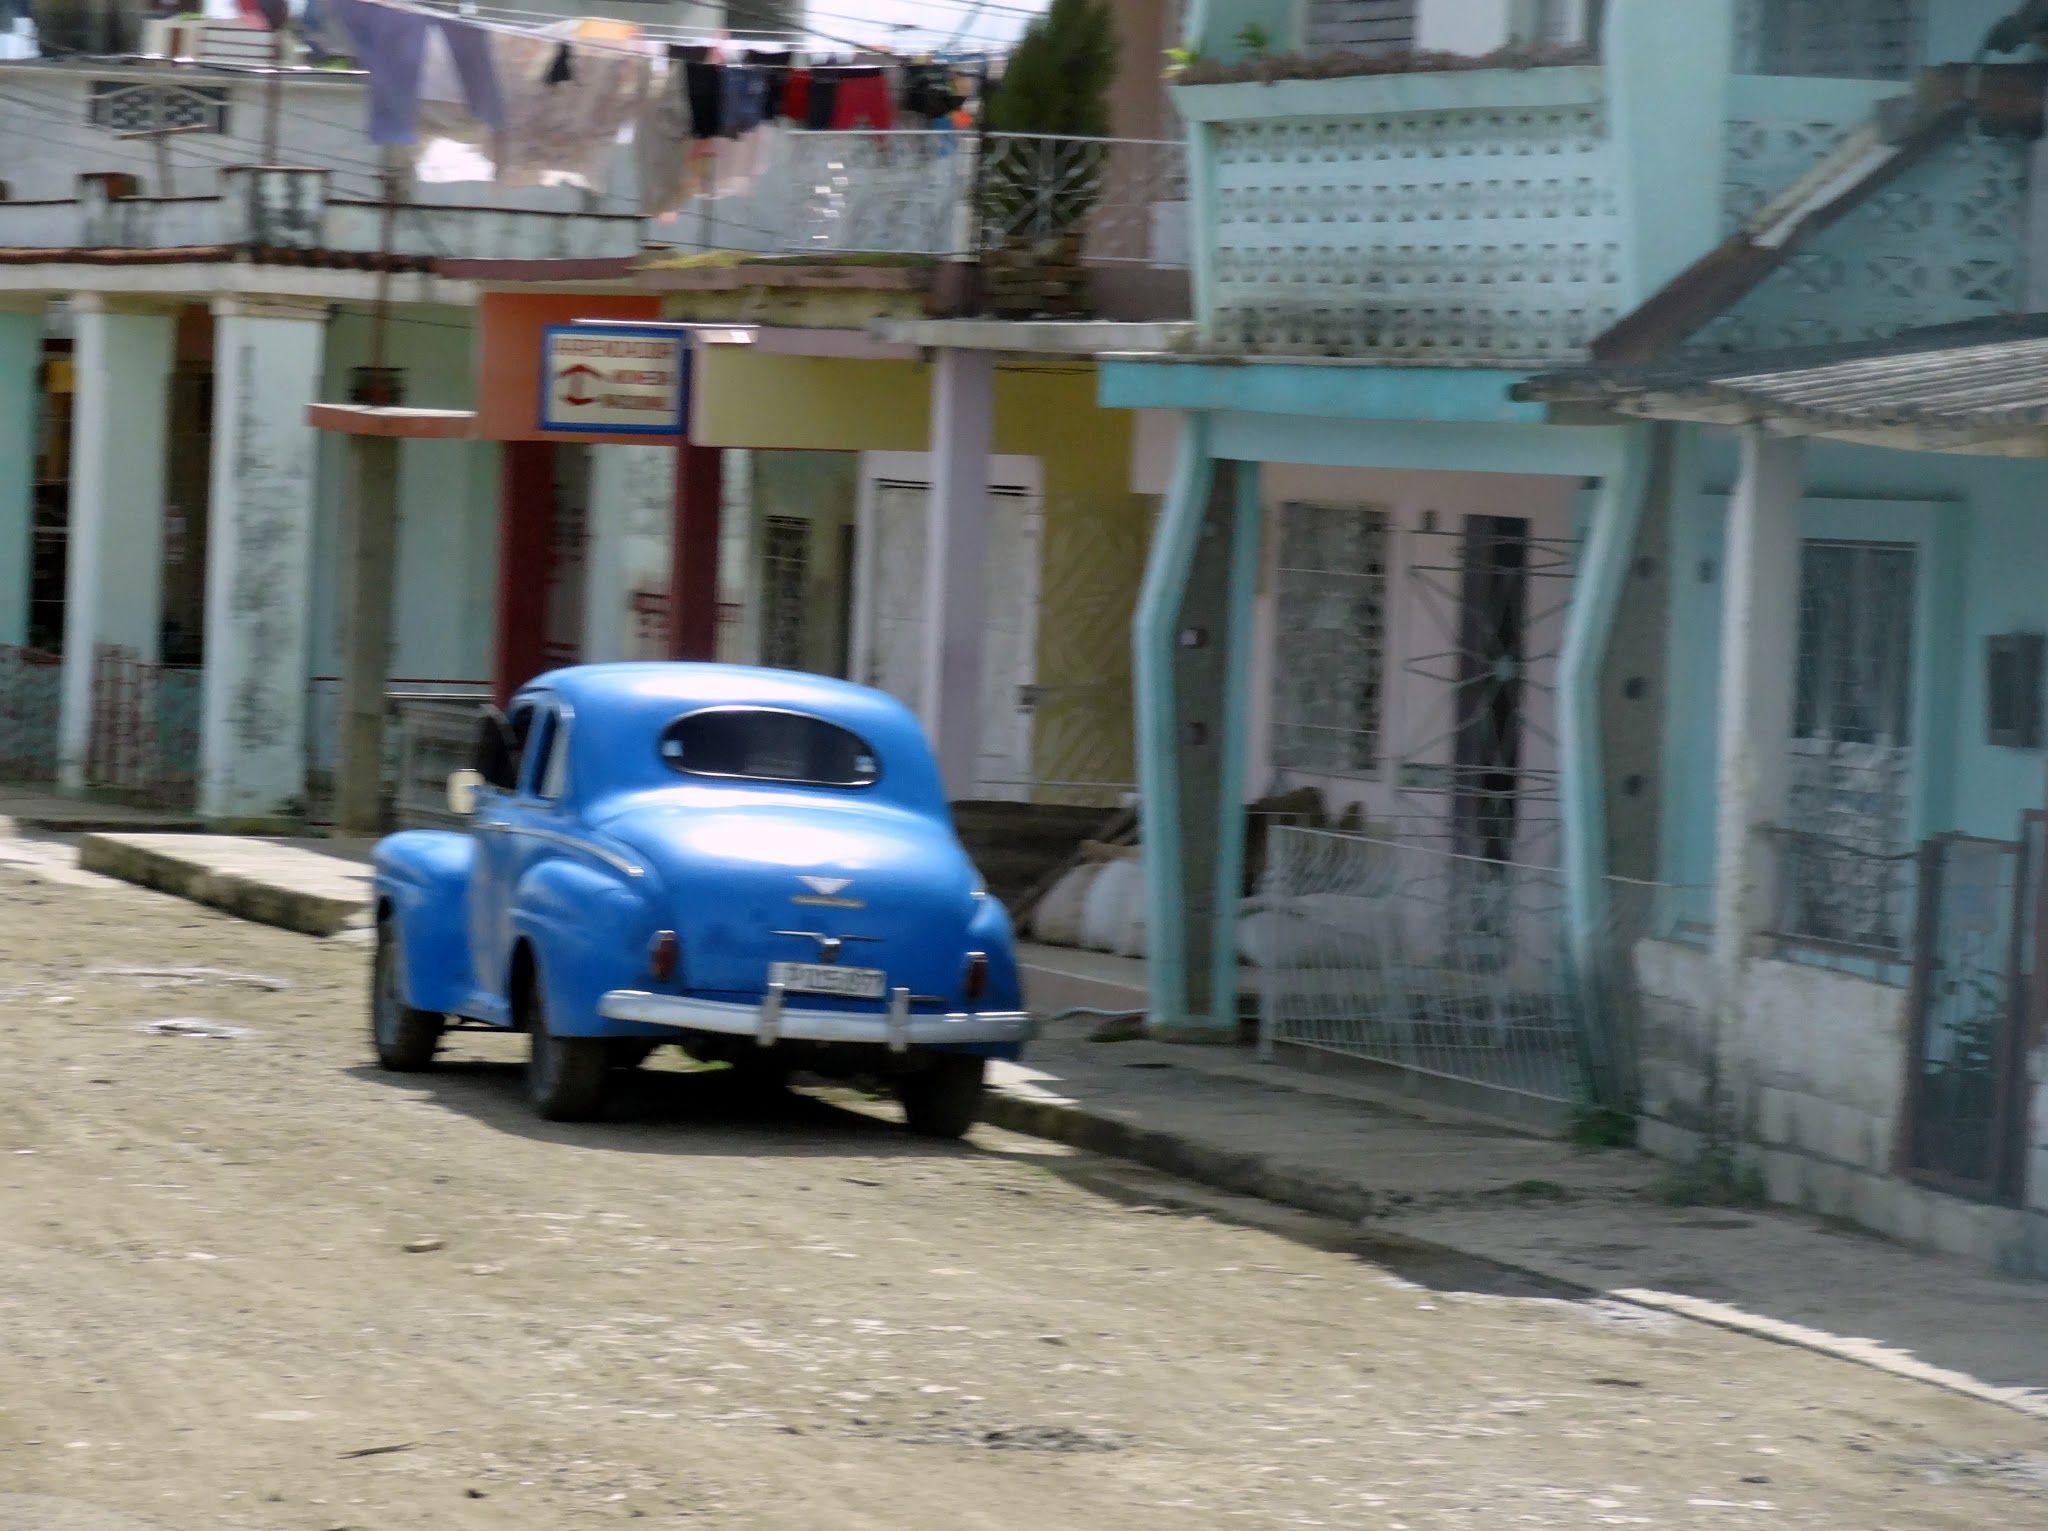 Classic car on the street in in Ciego de Ávila, Cuba. Photo taken by Brian Kaylor during a trip for the COEBAC's 40th anniversary celebration at Iglesia Bautista Enmanuel (Emmanuel Baptist Church).